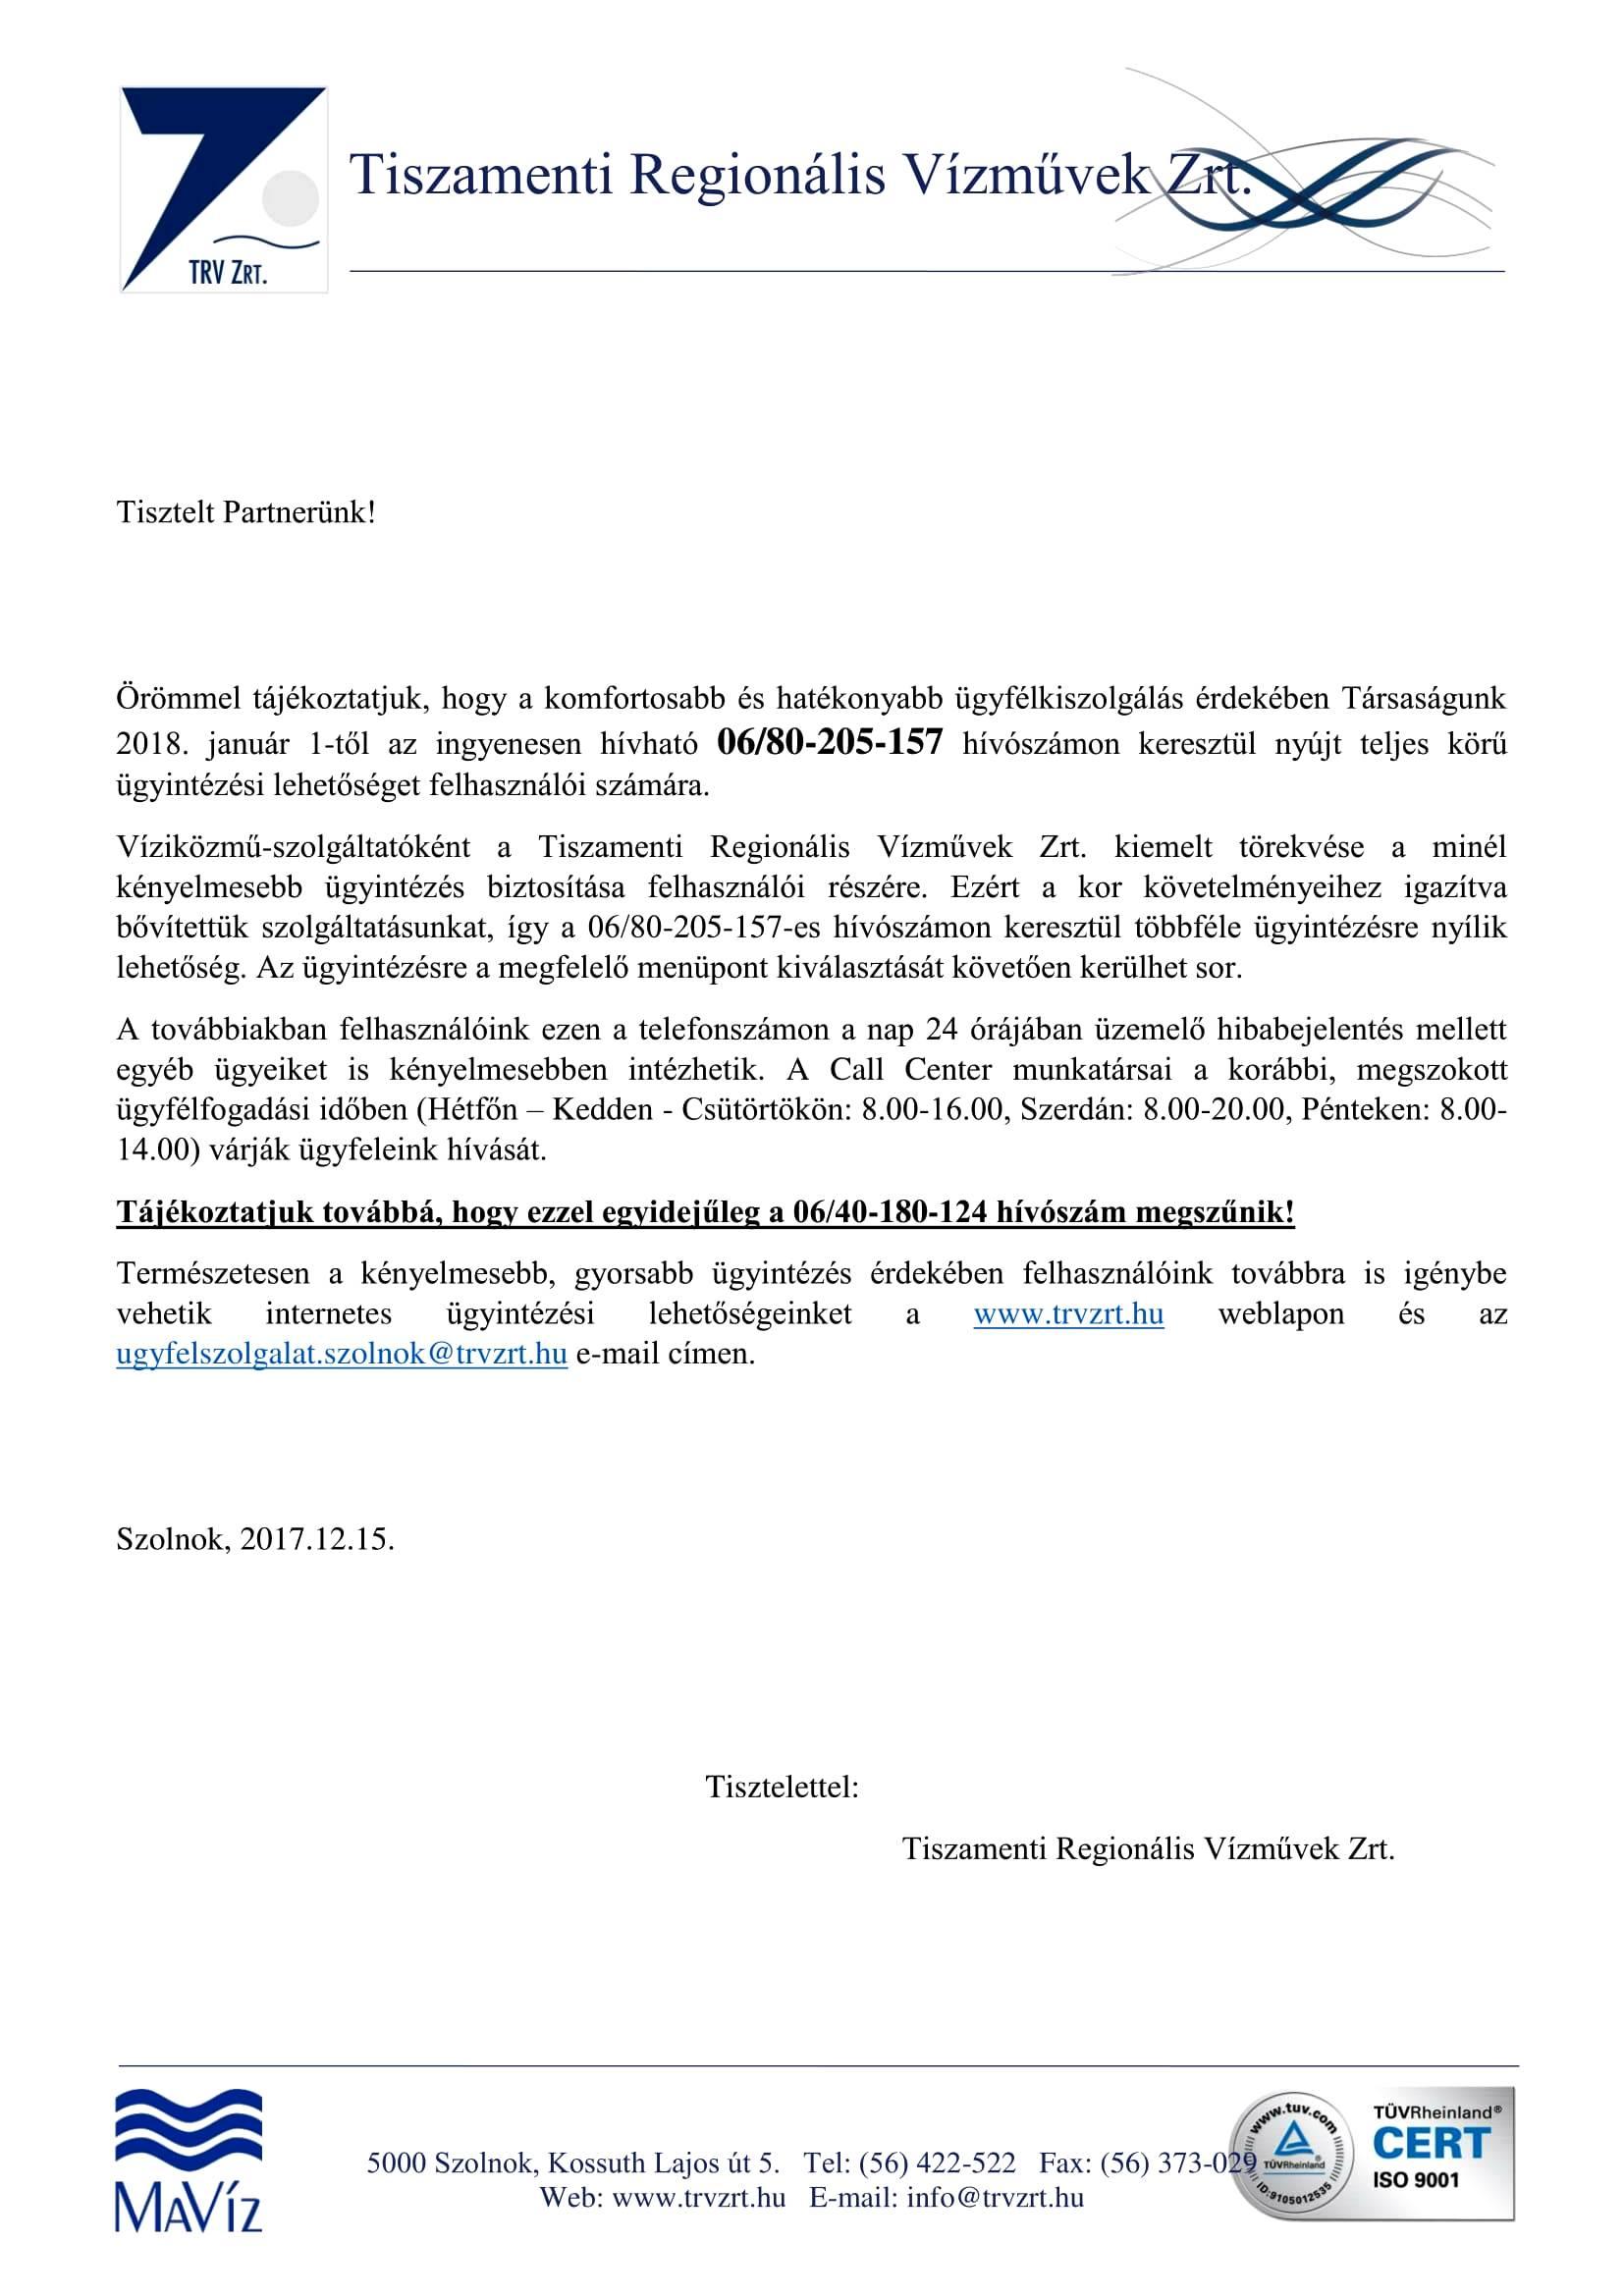 Tiszamenti telefonszam_valtozas-1